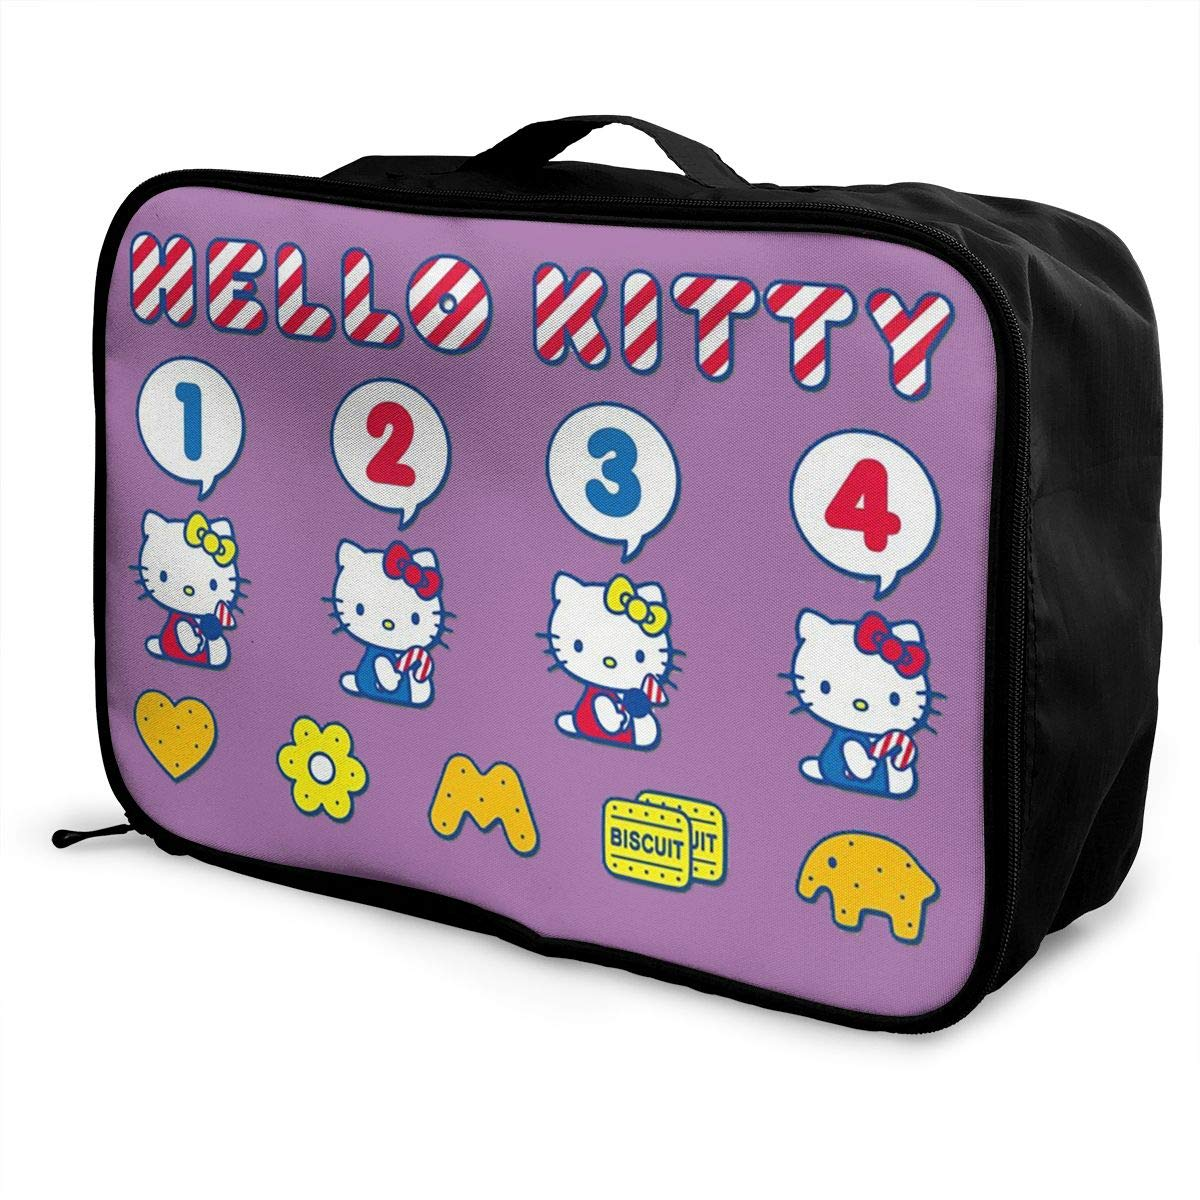 Women Travel Duffel Bag Hello Kitty Cartoon Handbags weekend trip tote Luggage